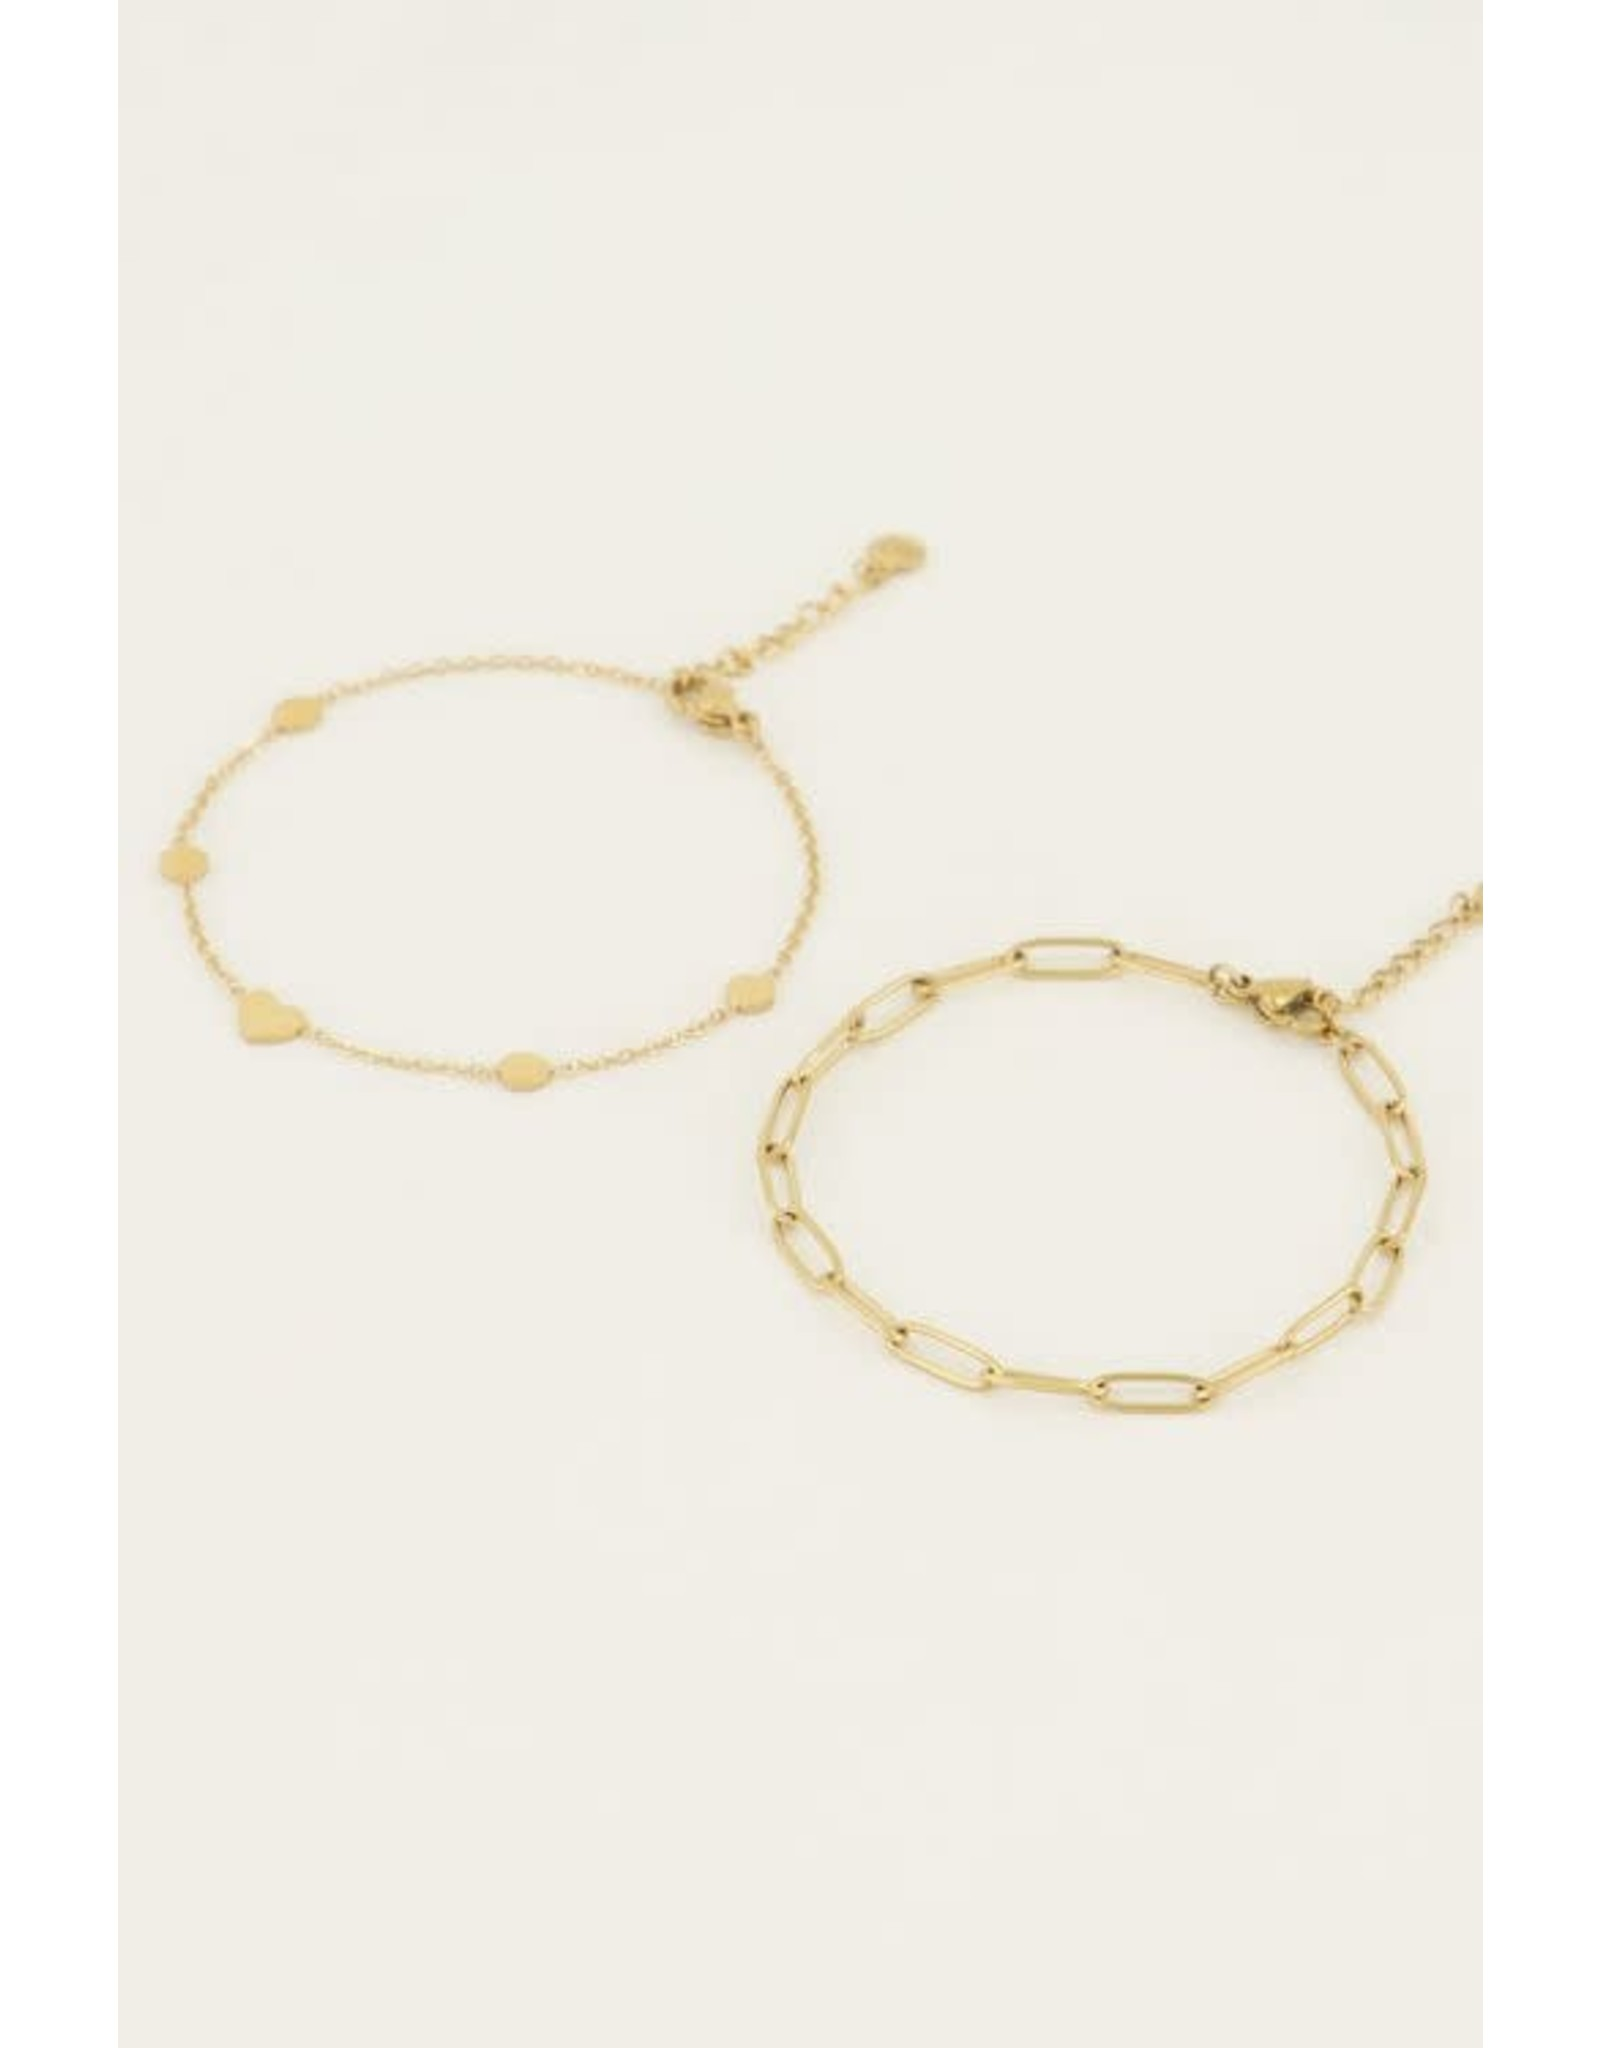 My Jewellery My Jewellery armbanden set schakel